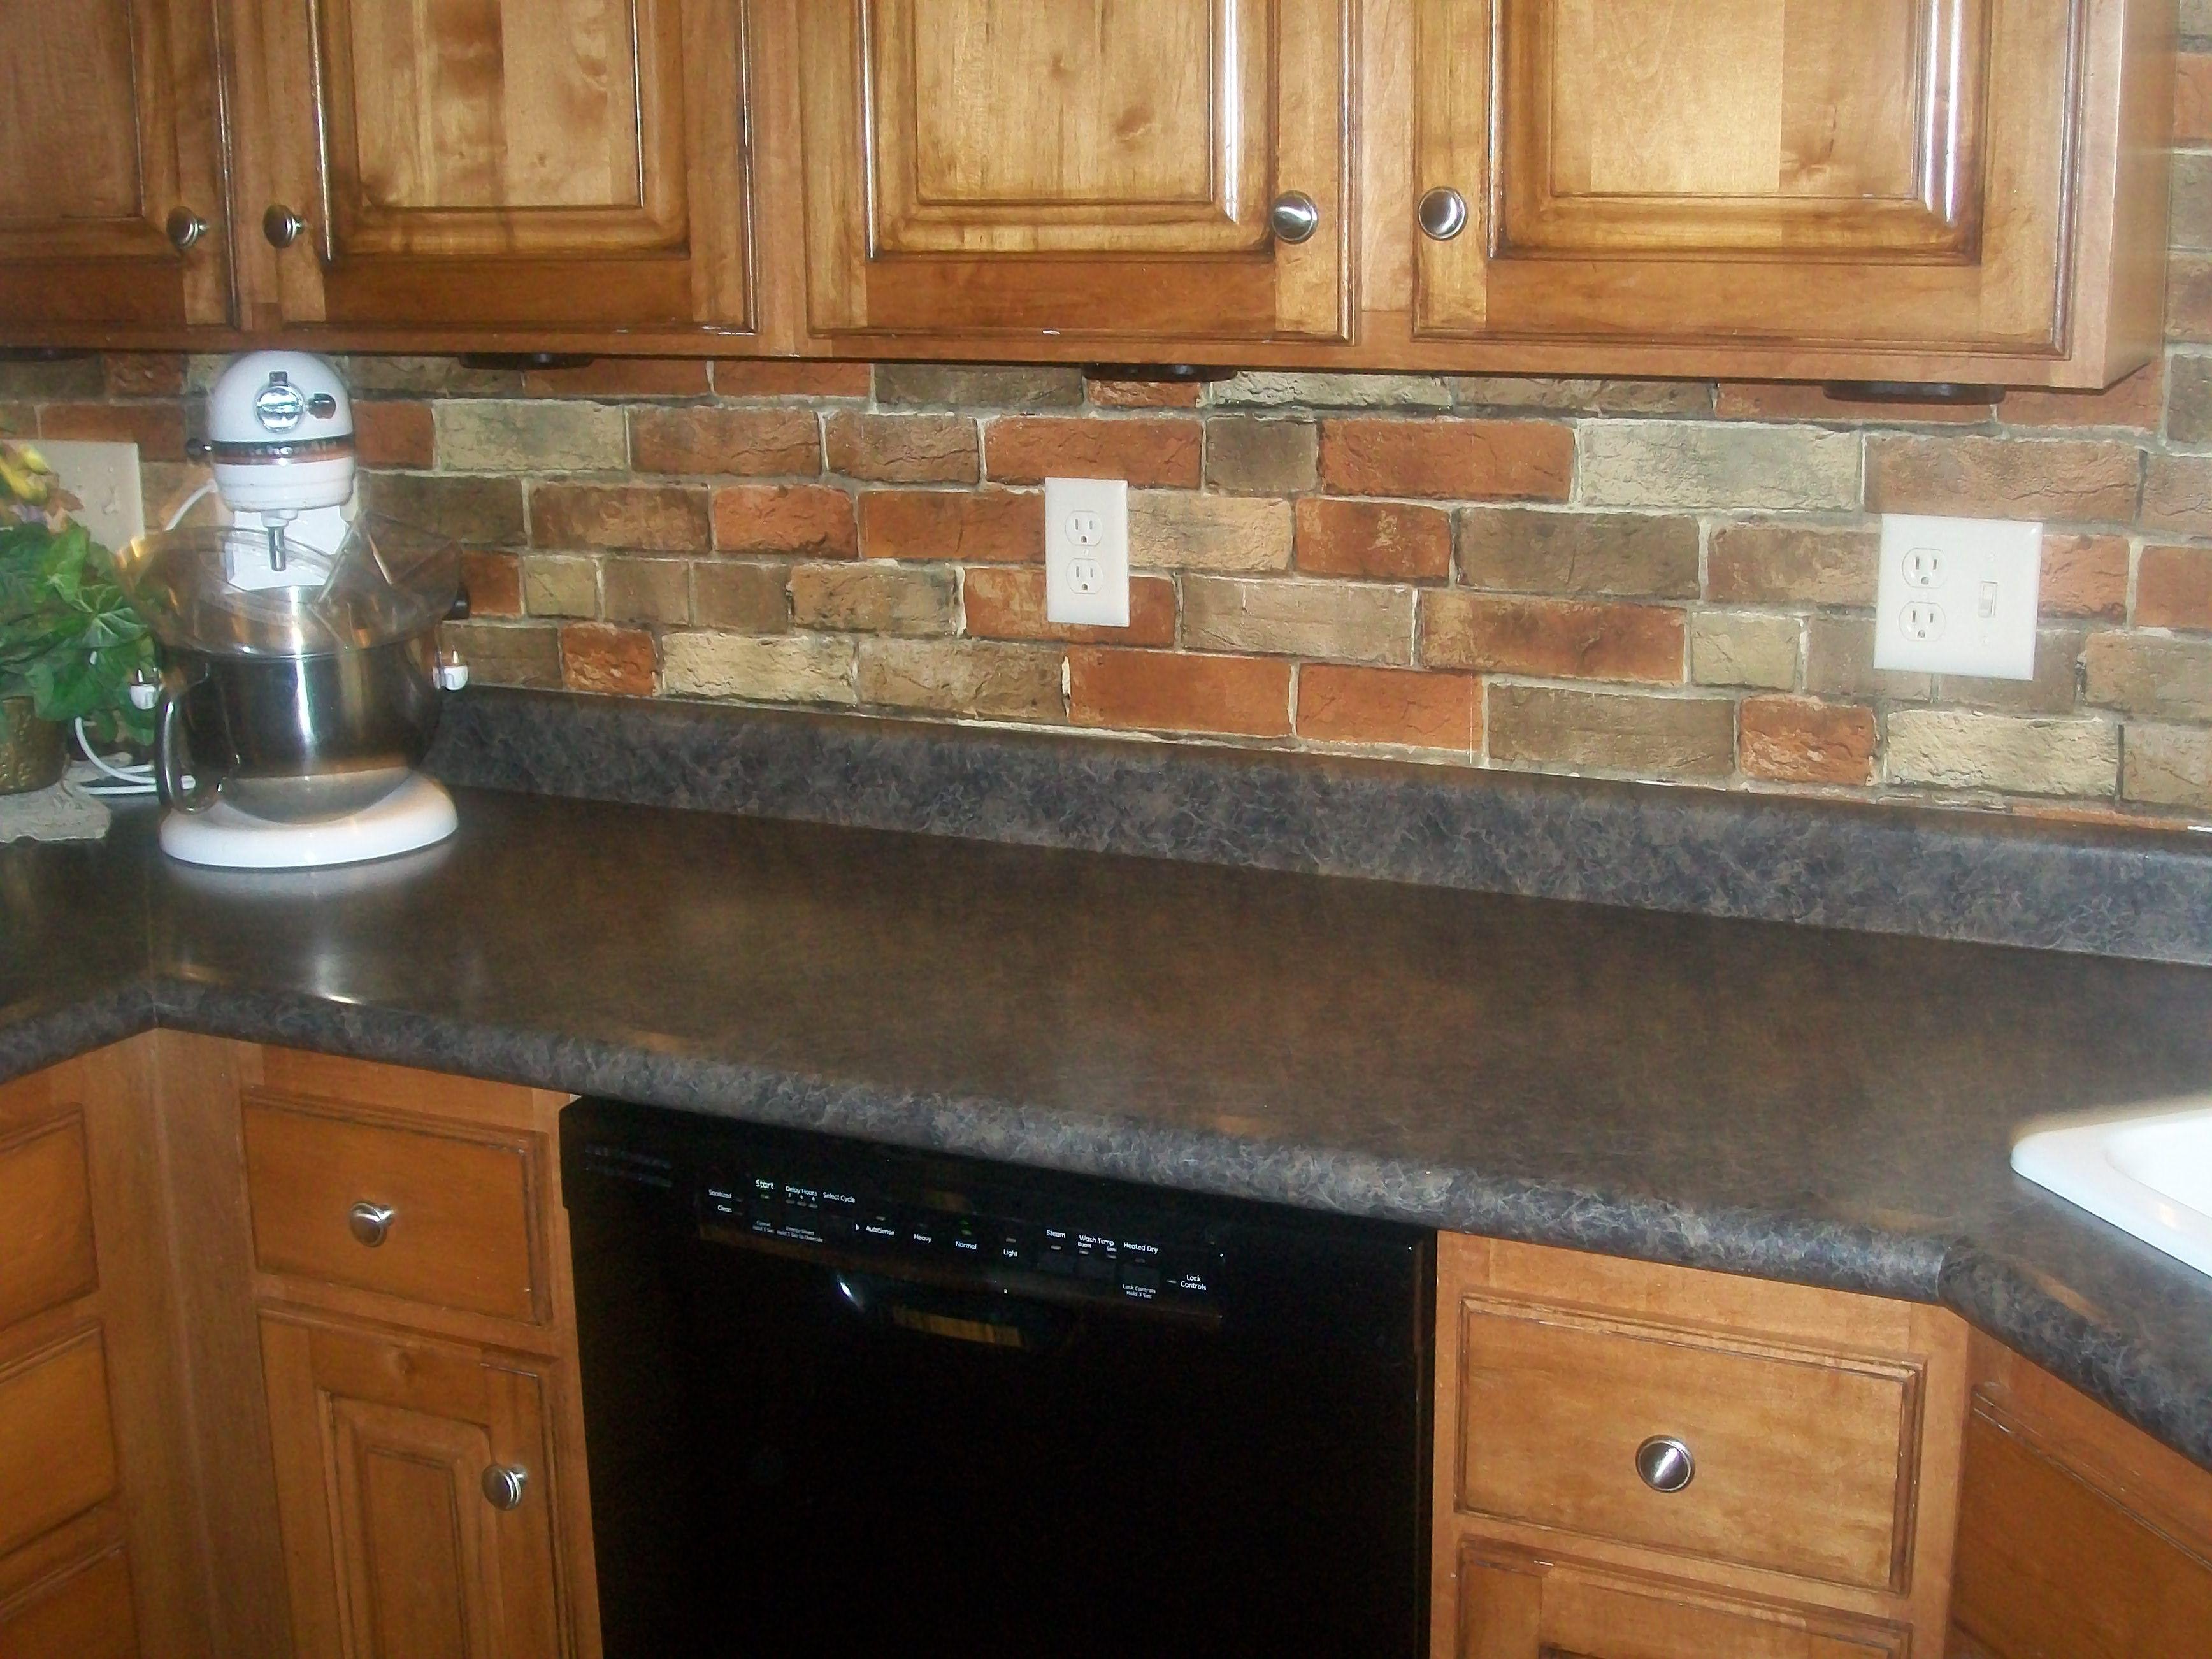 - Faux Brick Wallpaper! In 2020 Brick Wallpaper Kitchen, Faux